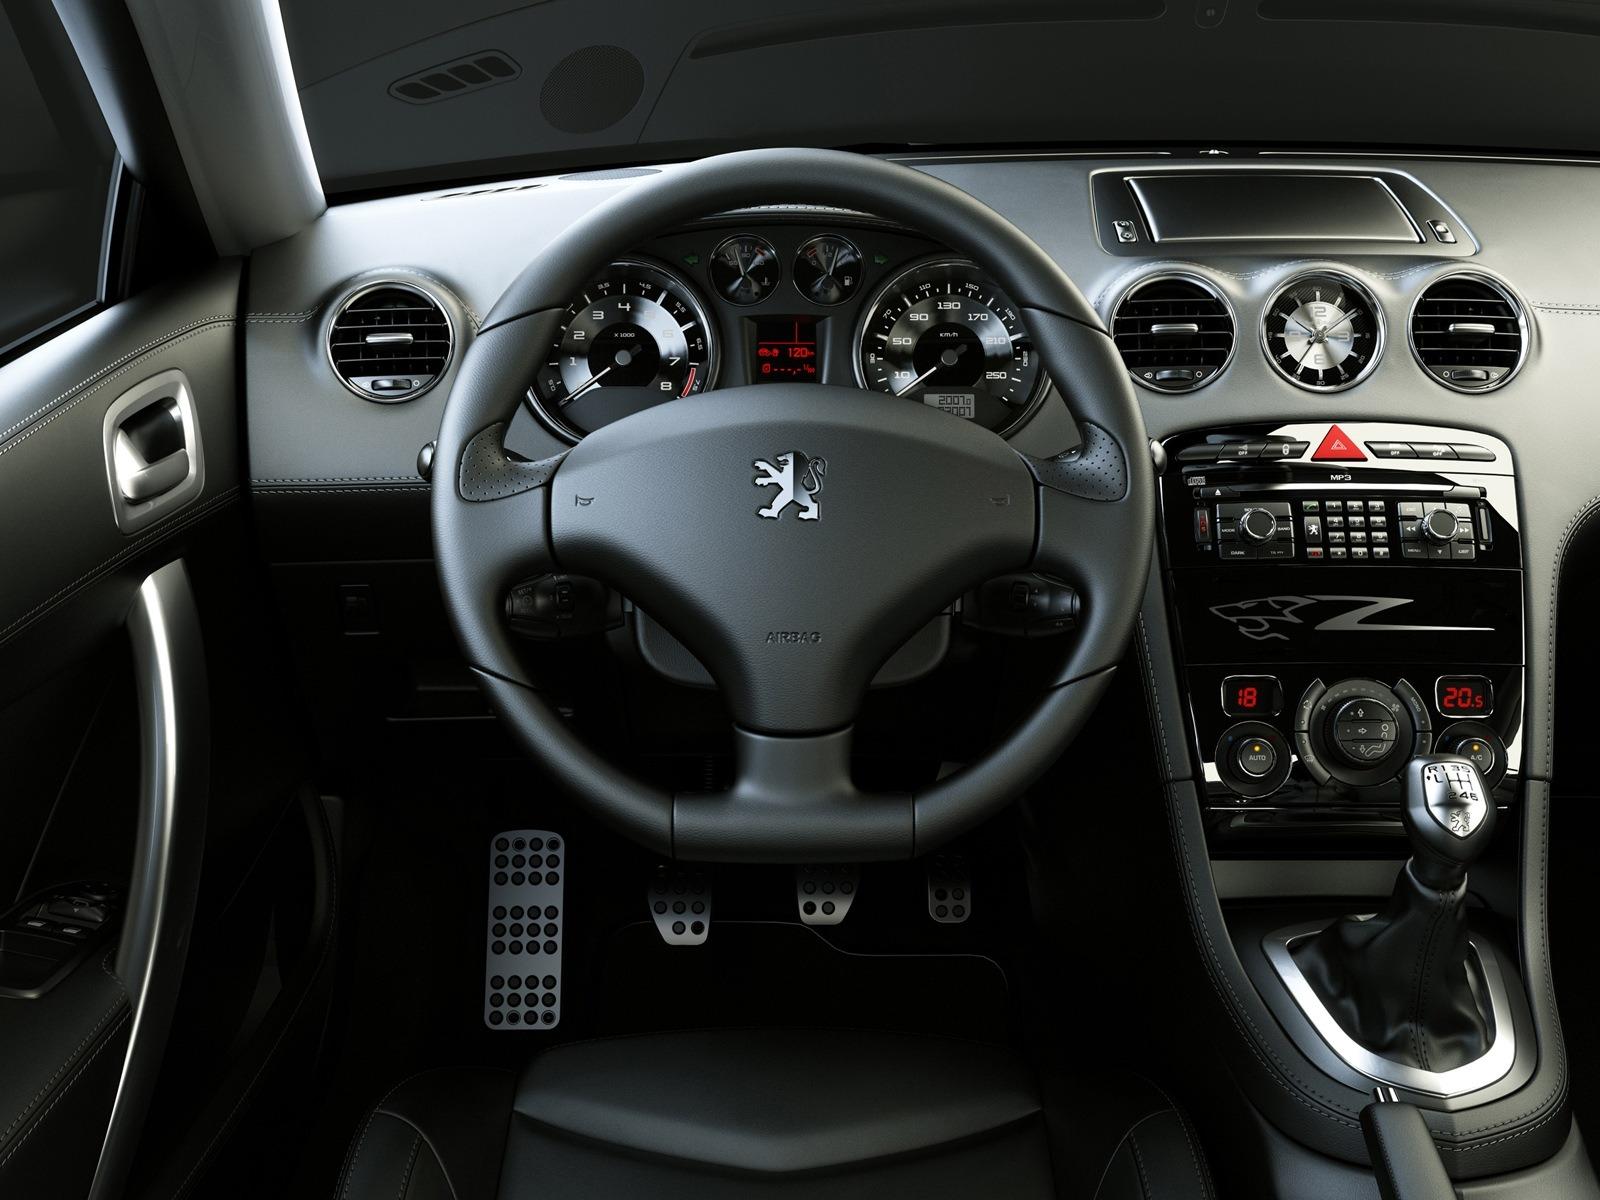 Peugeot 308 RCZ dashboard Wallpaper Peugeot Cars Wallpapers in jpg ...